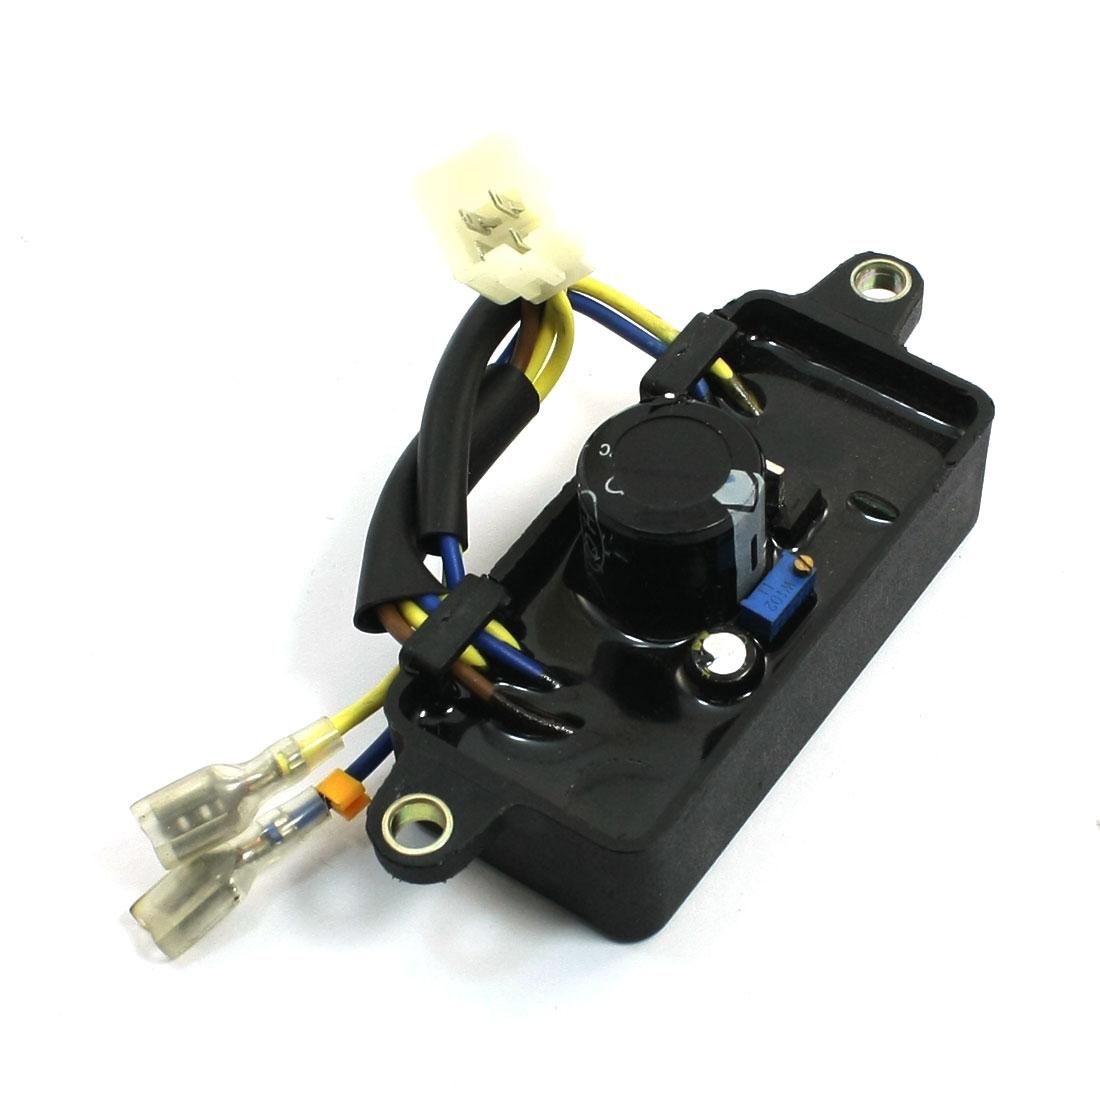 Generator Wired 2.8KW 220uF 250V Voltage Regulator for Motocycle